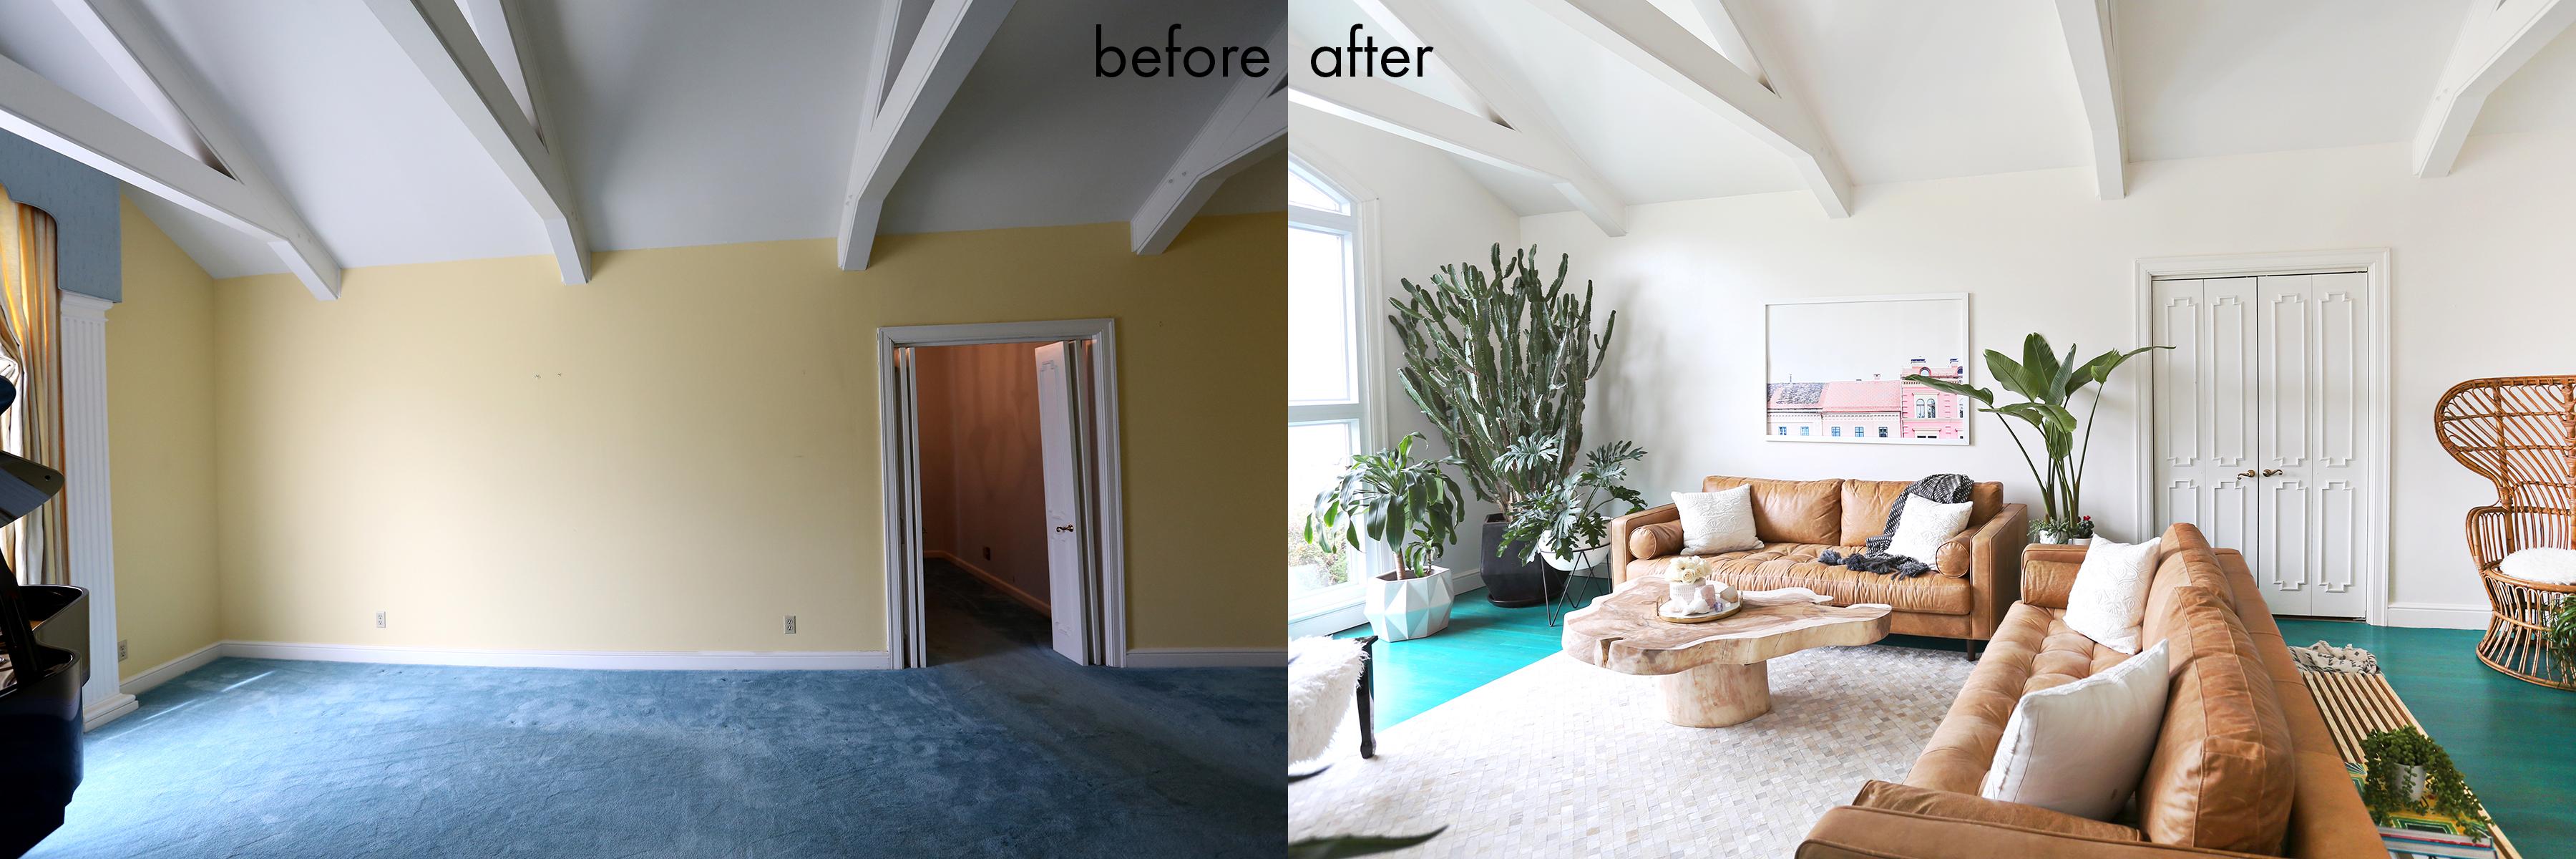 Elsie Larson's living room before + after!